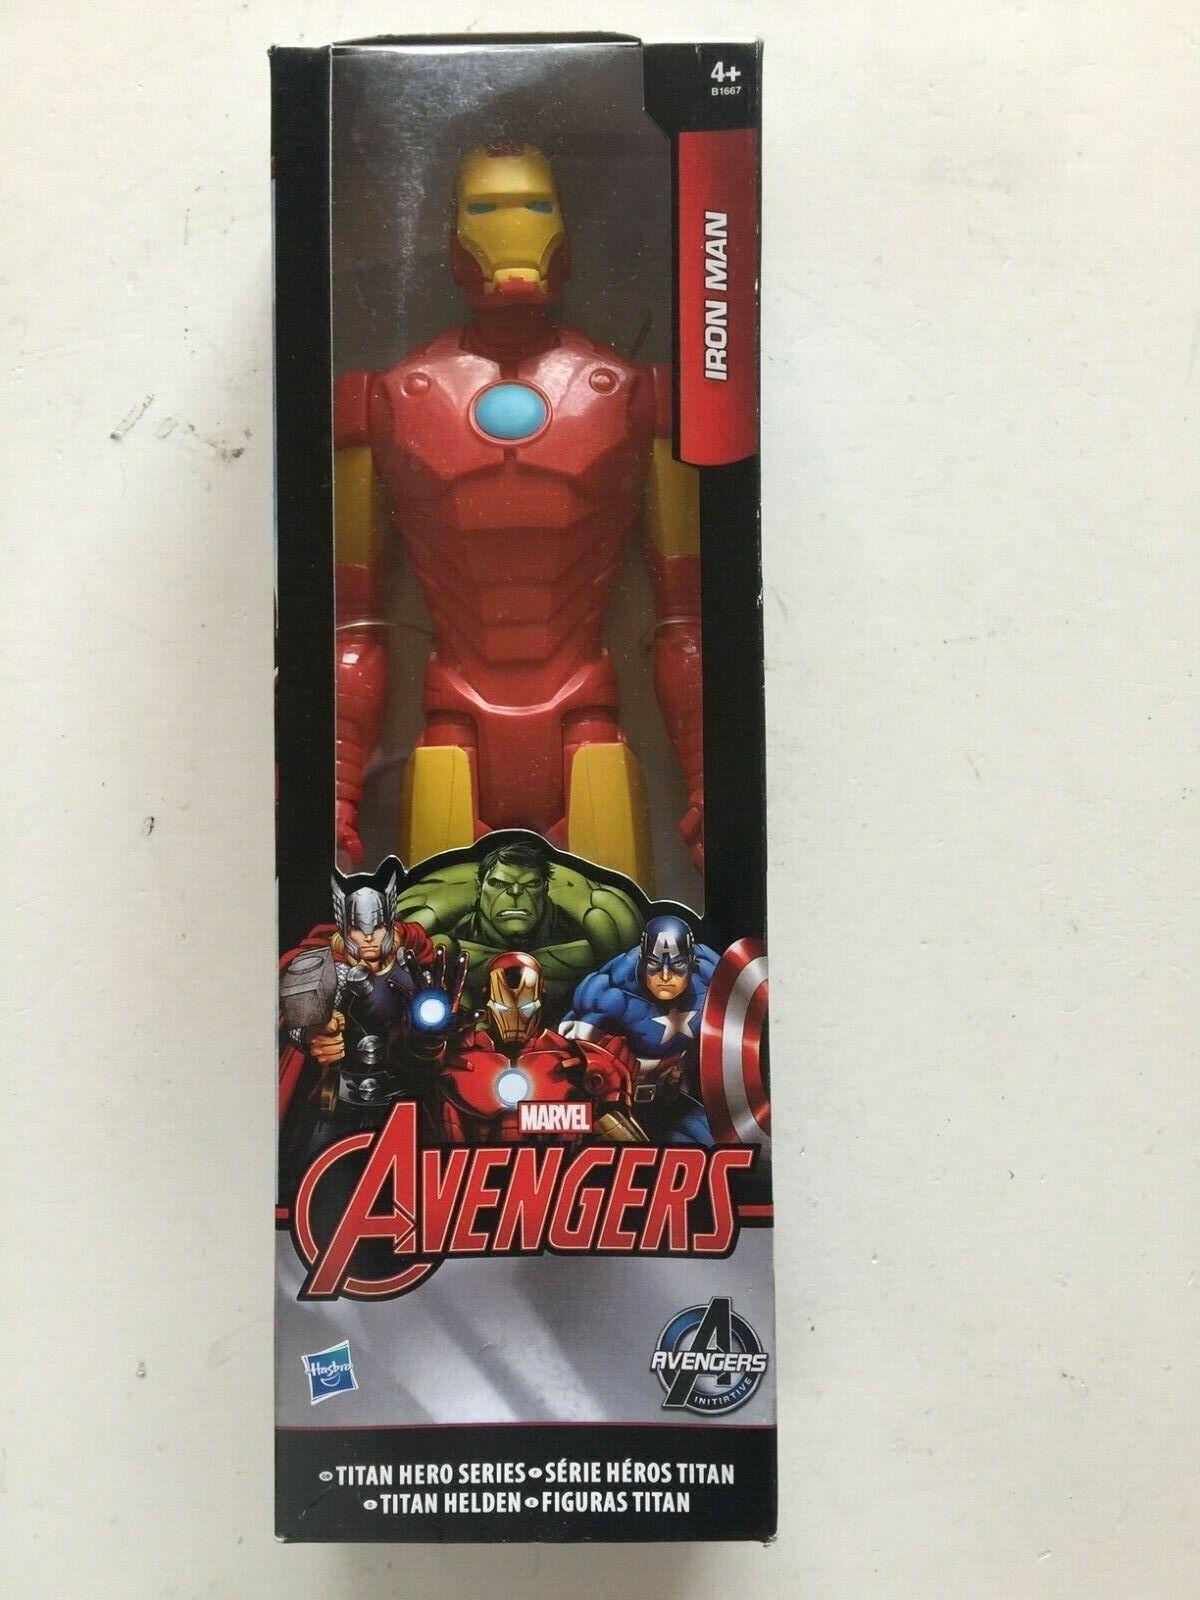 Marvel avengers Titan Hero Series Iron Man Figurine Hasbro B1667 BRAND NEW